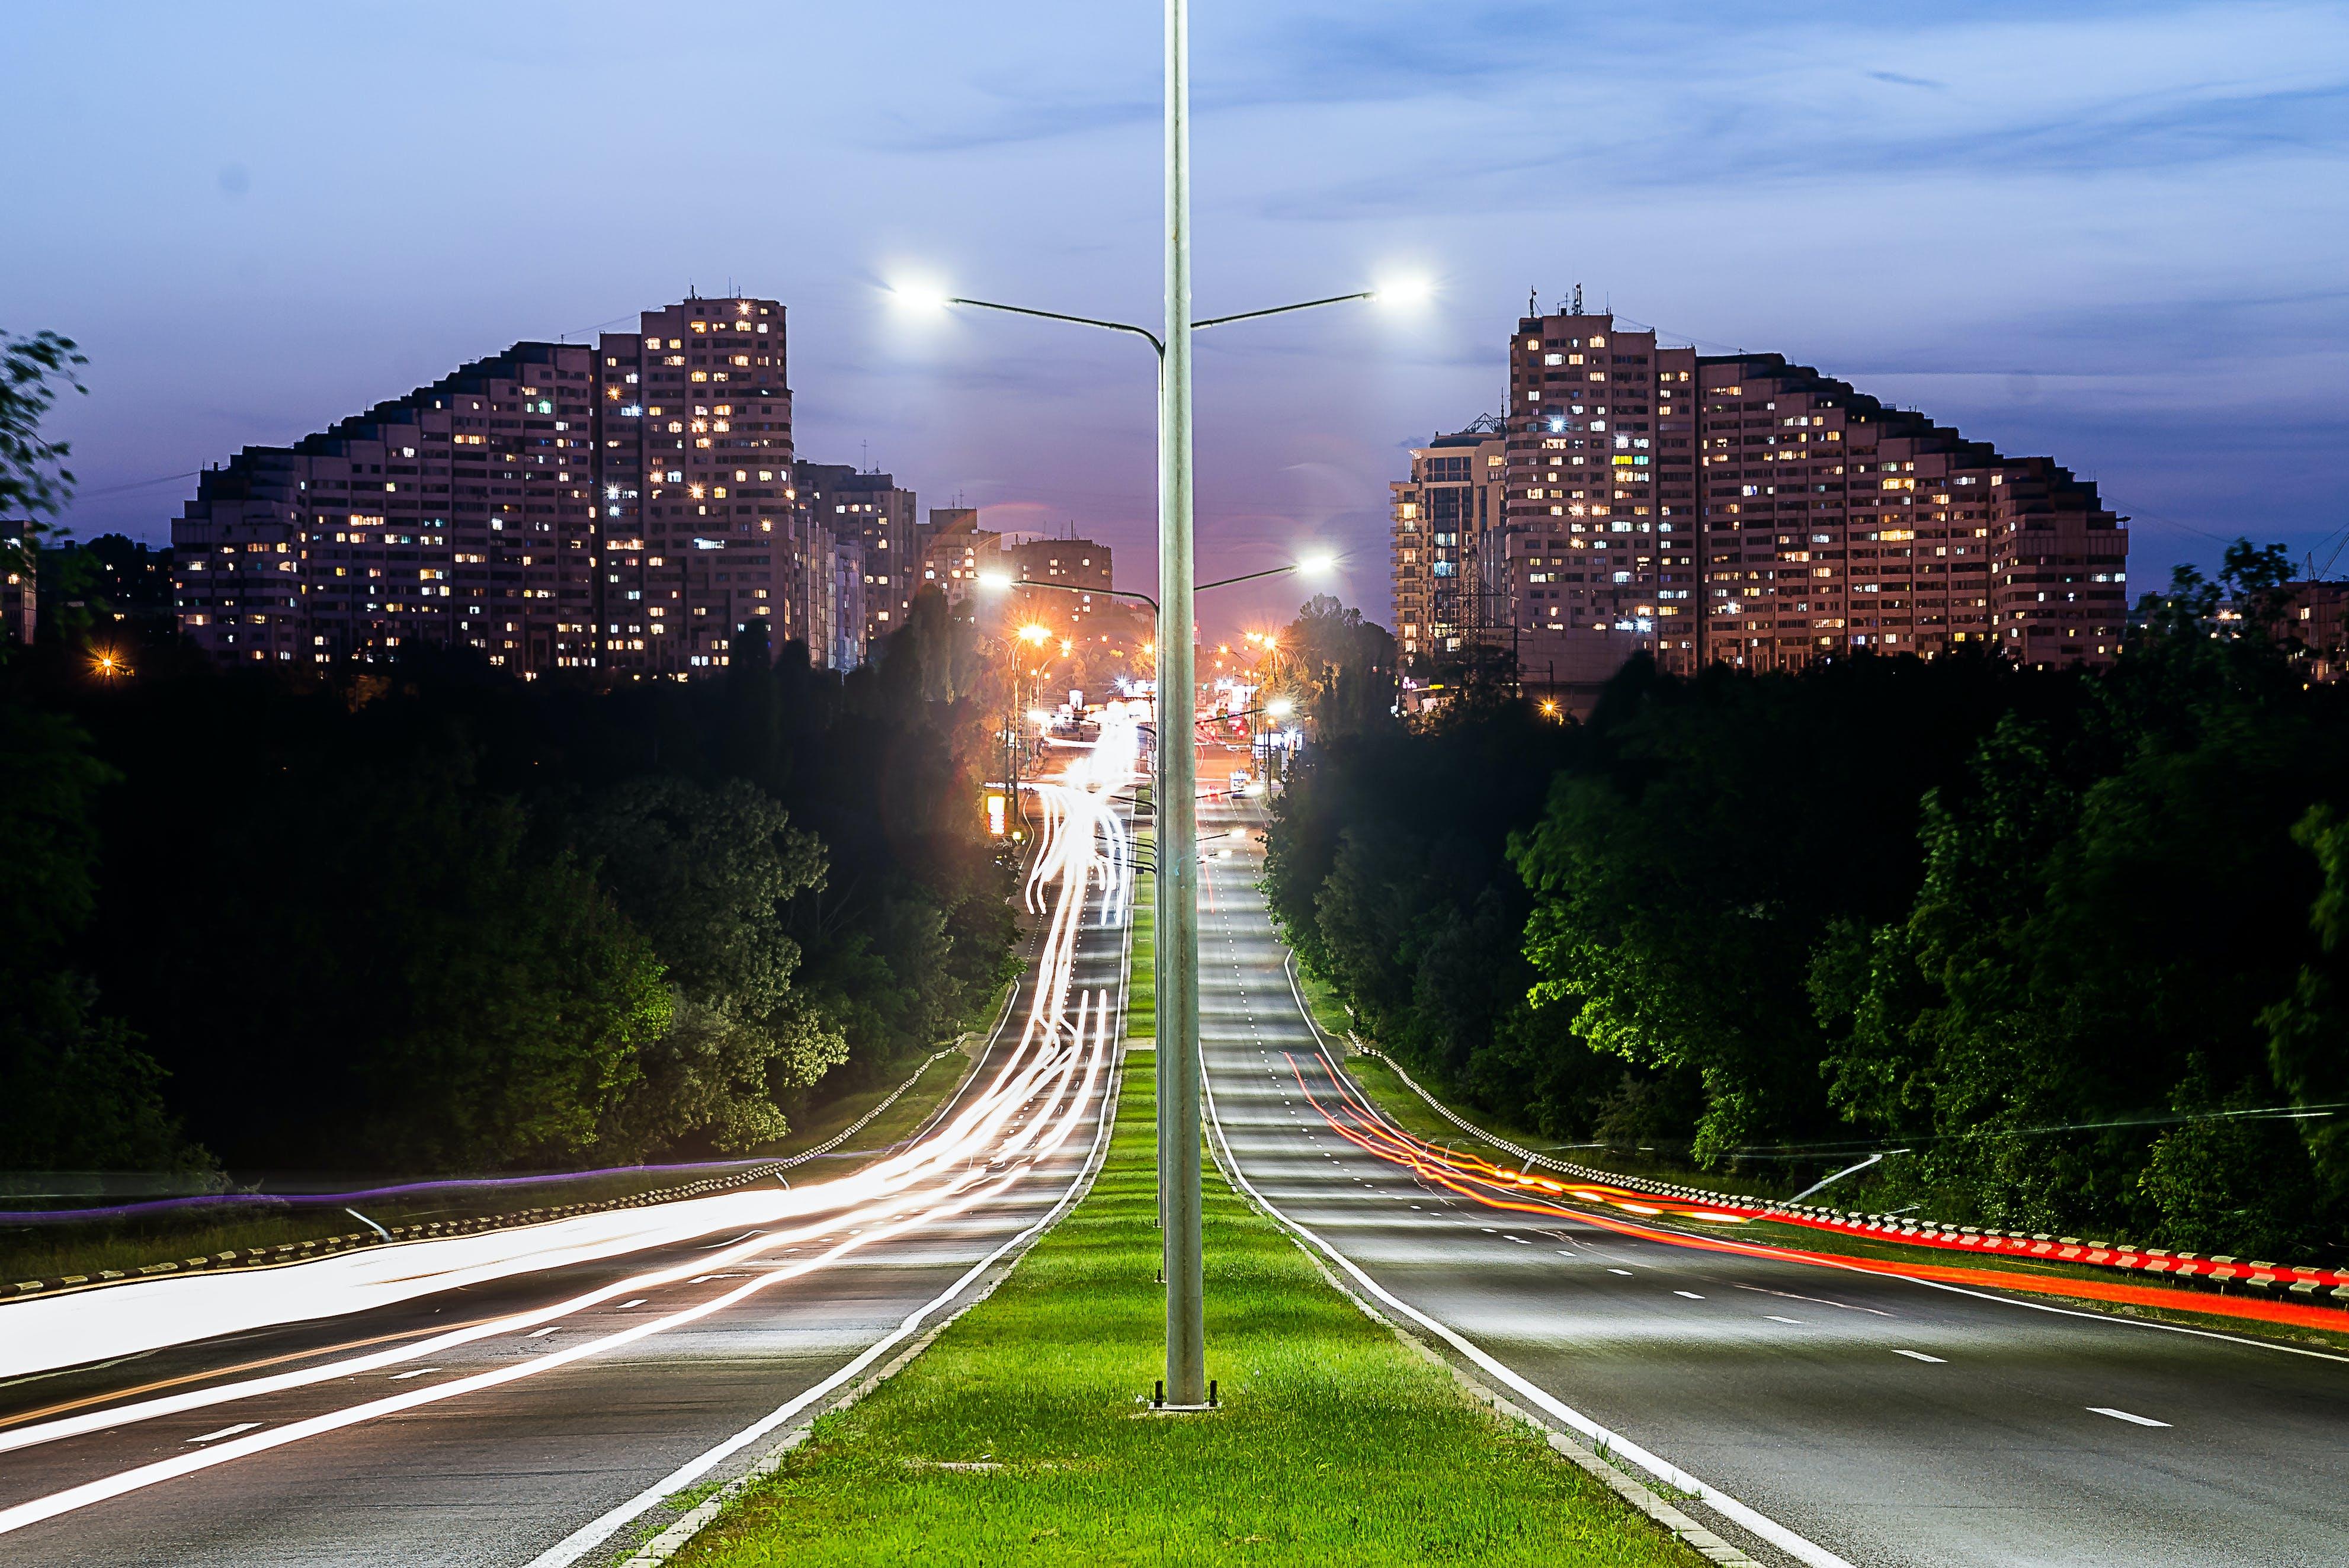 Gratis arkivbilde med asfalt, by, bygninger, gatelamper